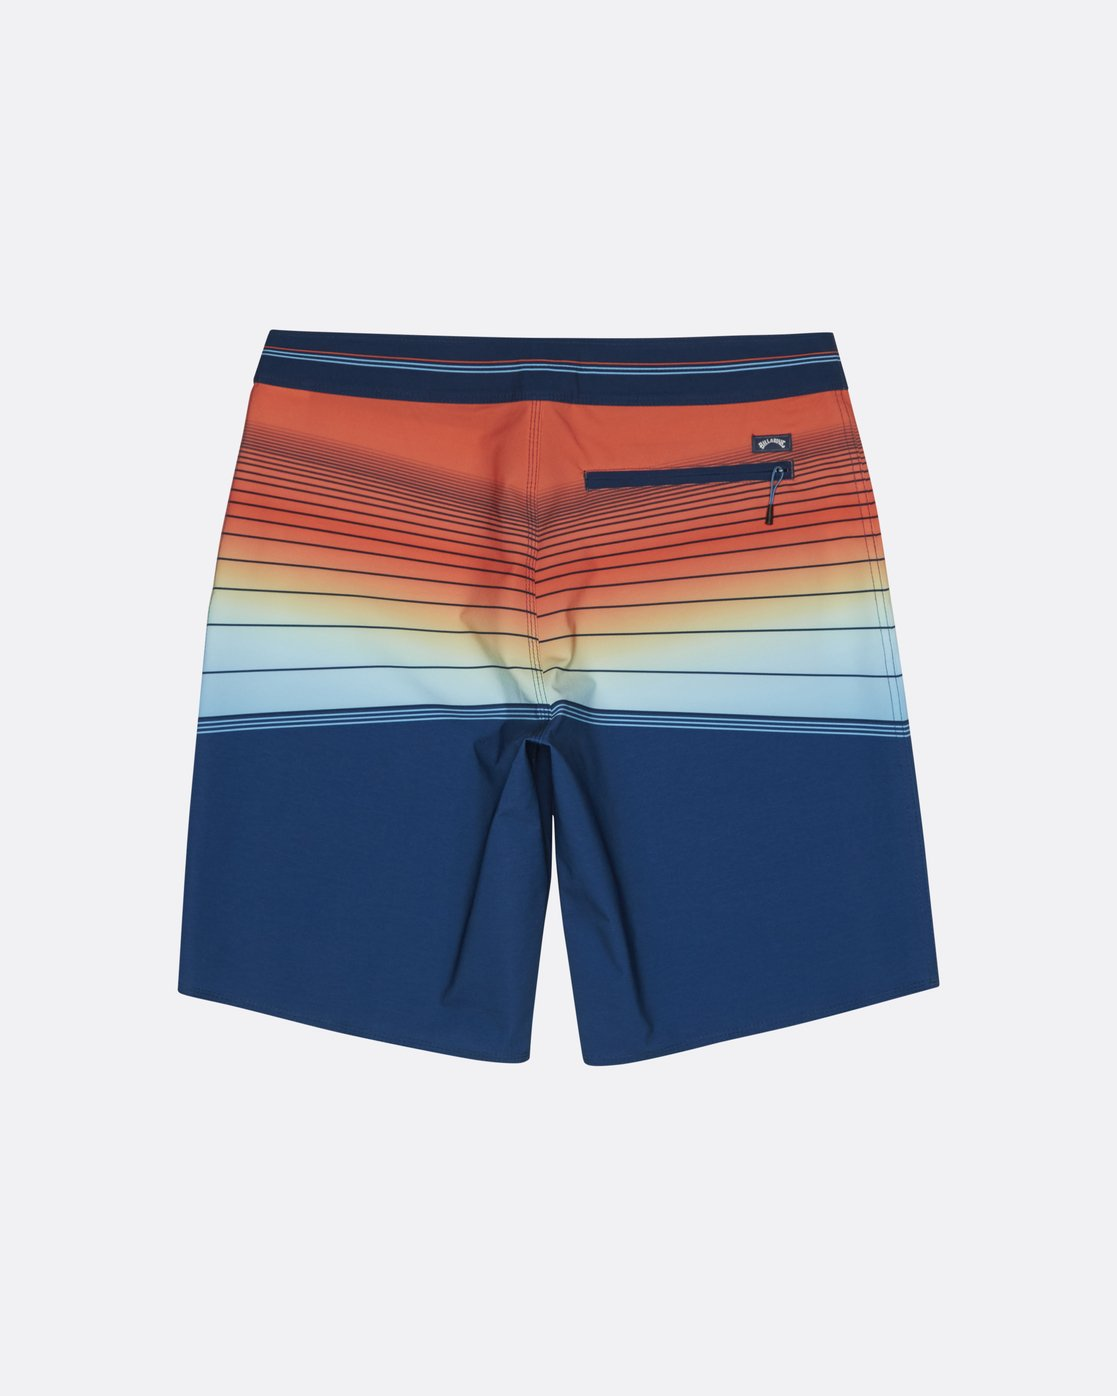 BILLABONG Mens North Point Pro Swim Trunks